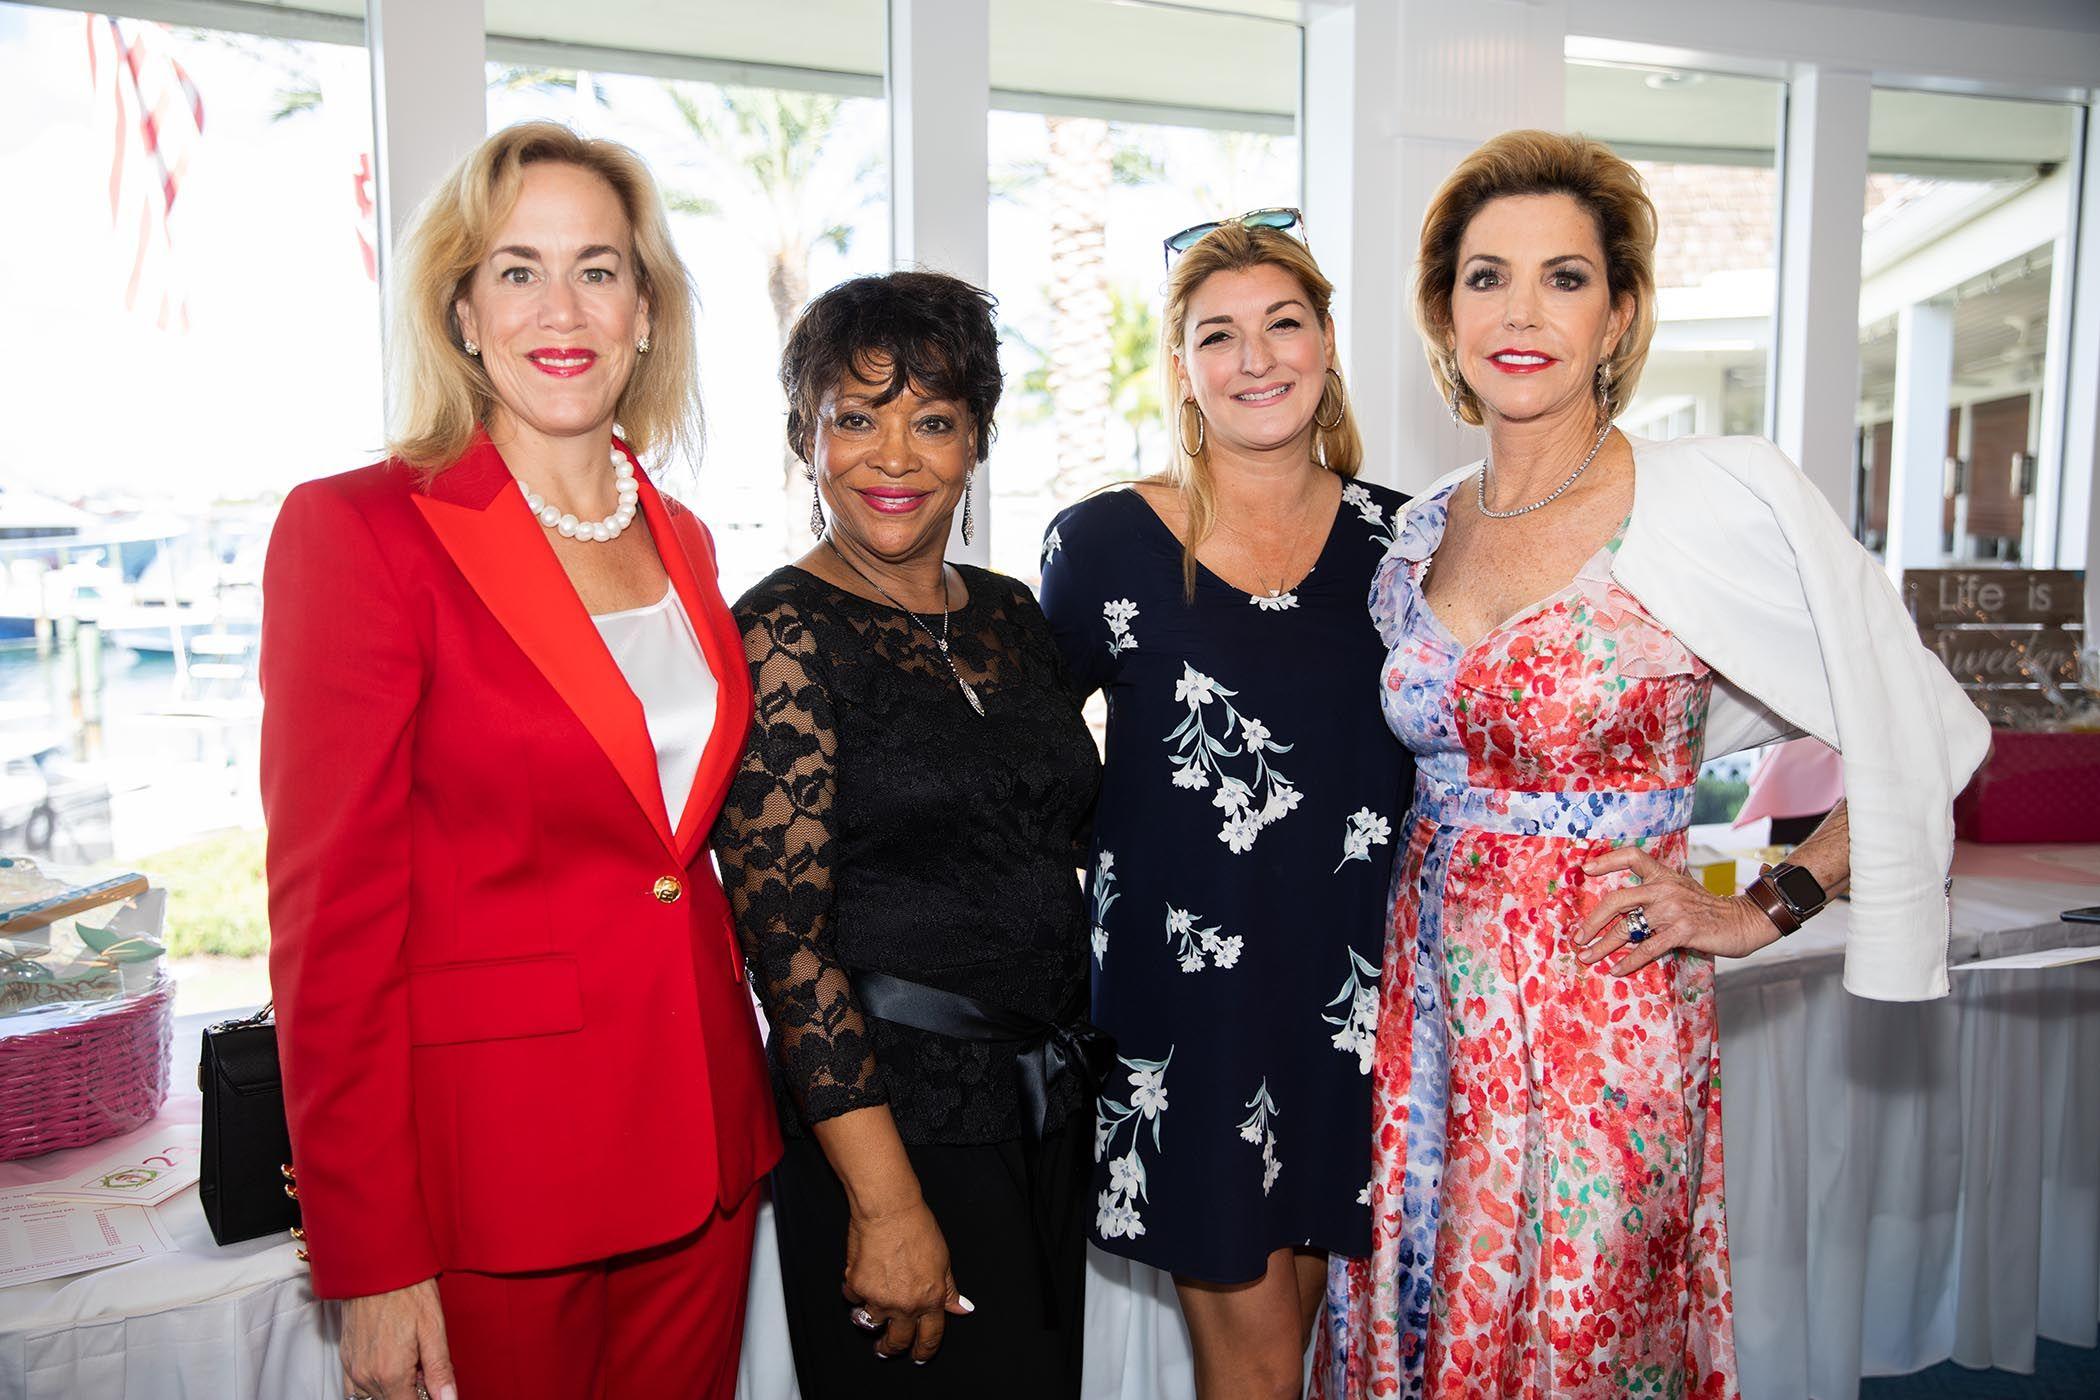 Sheila Carnicelli | Edwinia Ellison | Kristina Olsen | Laura Moore Tanne